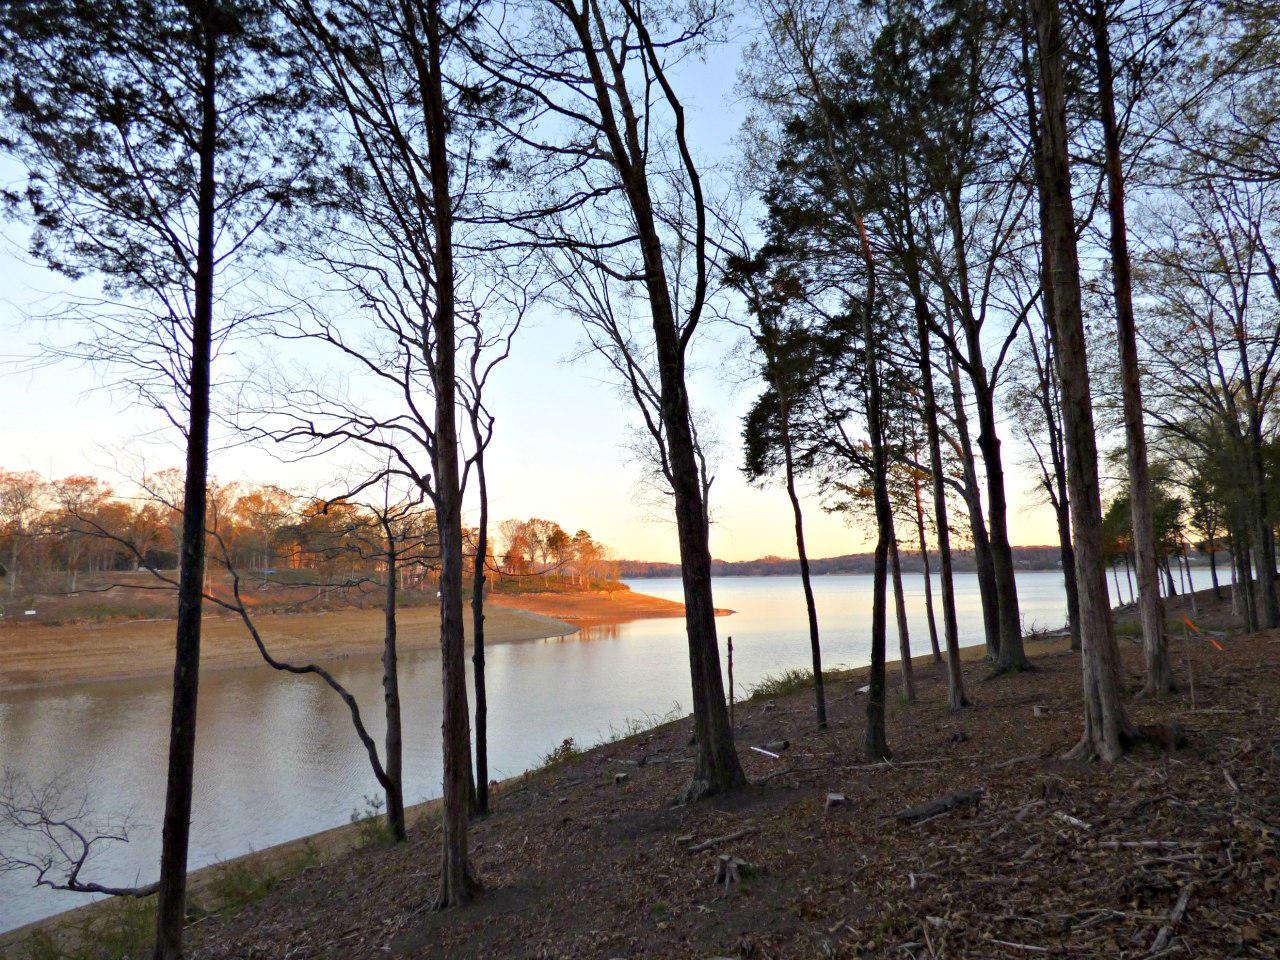 Photo for Lot 125 Ridge Point Tr, Dandridge, TN 37725 (MLS # 1136115)